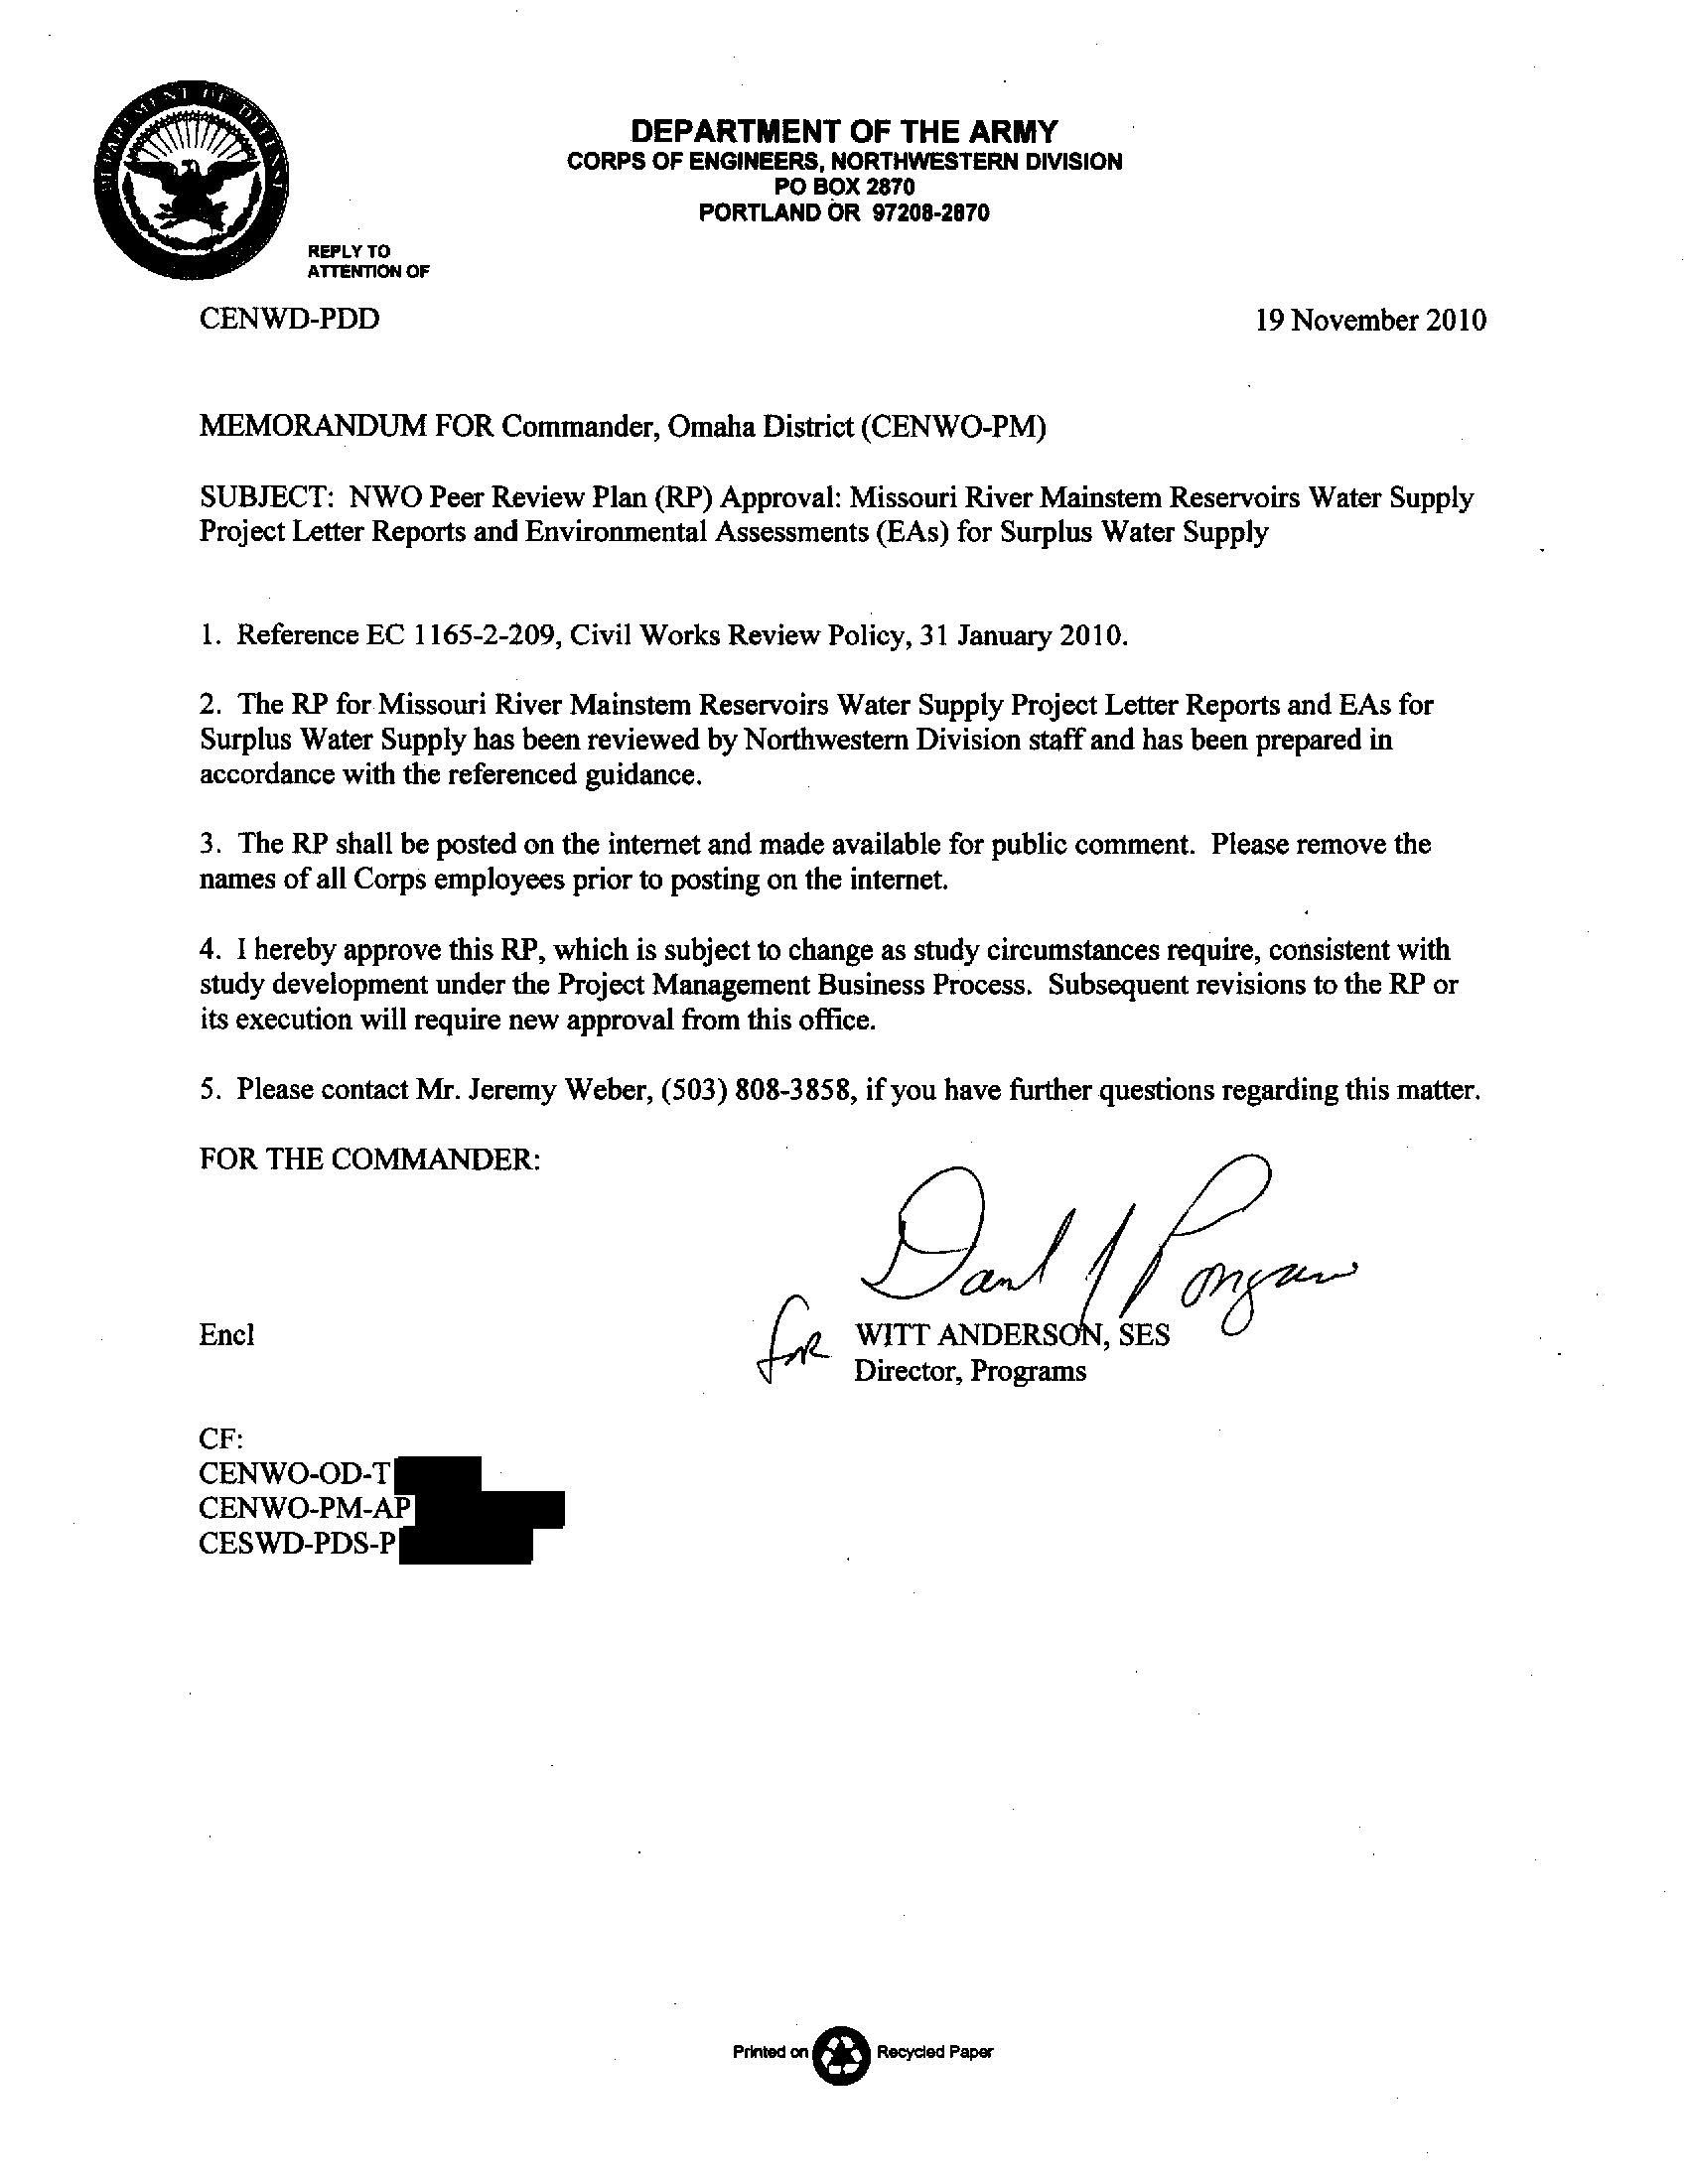 Memorandum for Commander, Omaha District (CENWO-PM): Subject